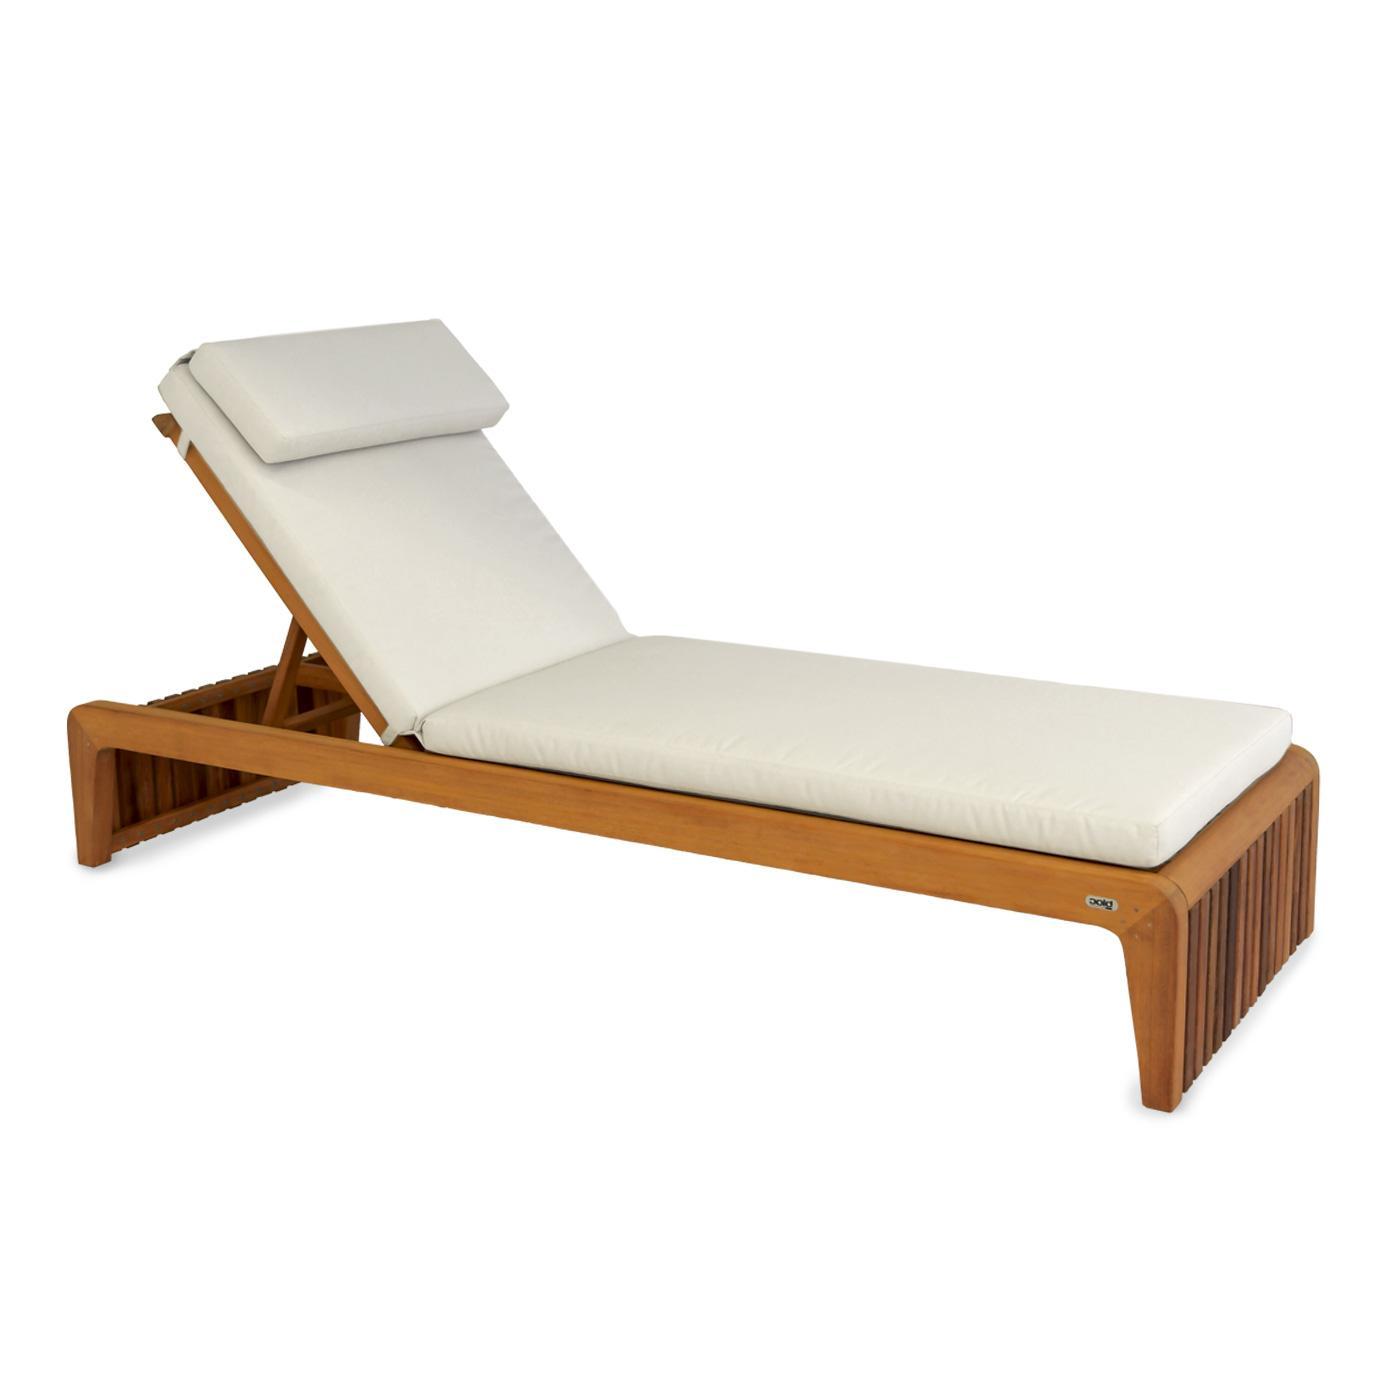 serengeti-sun-lounger-ecru-1